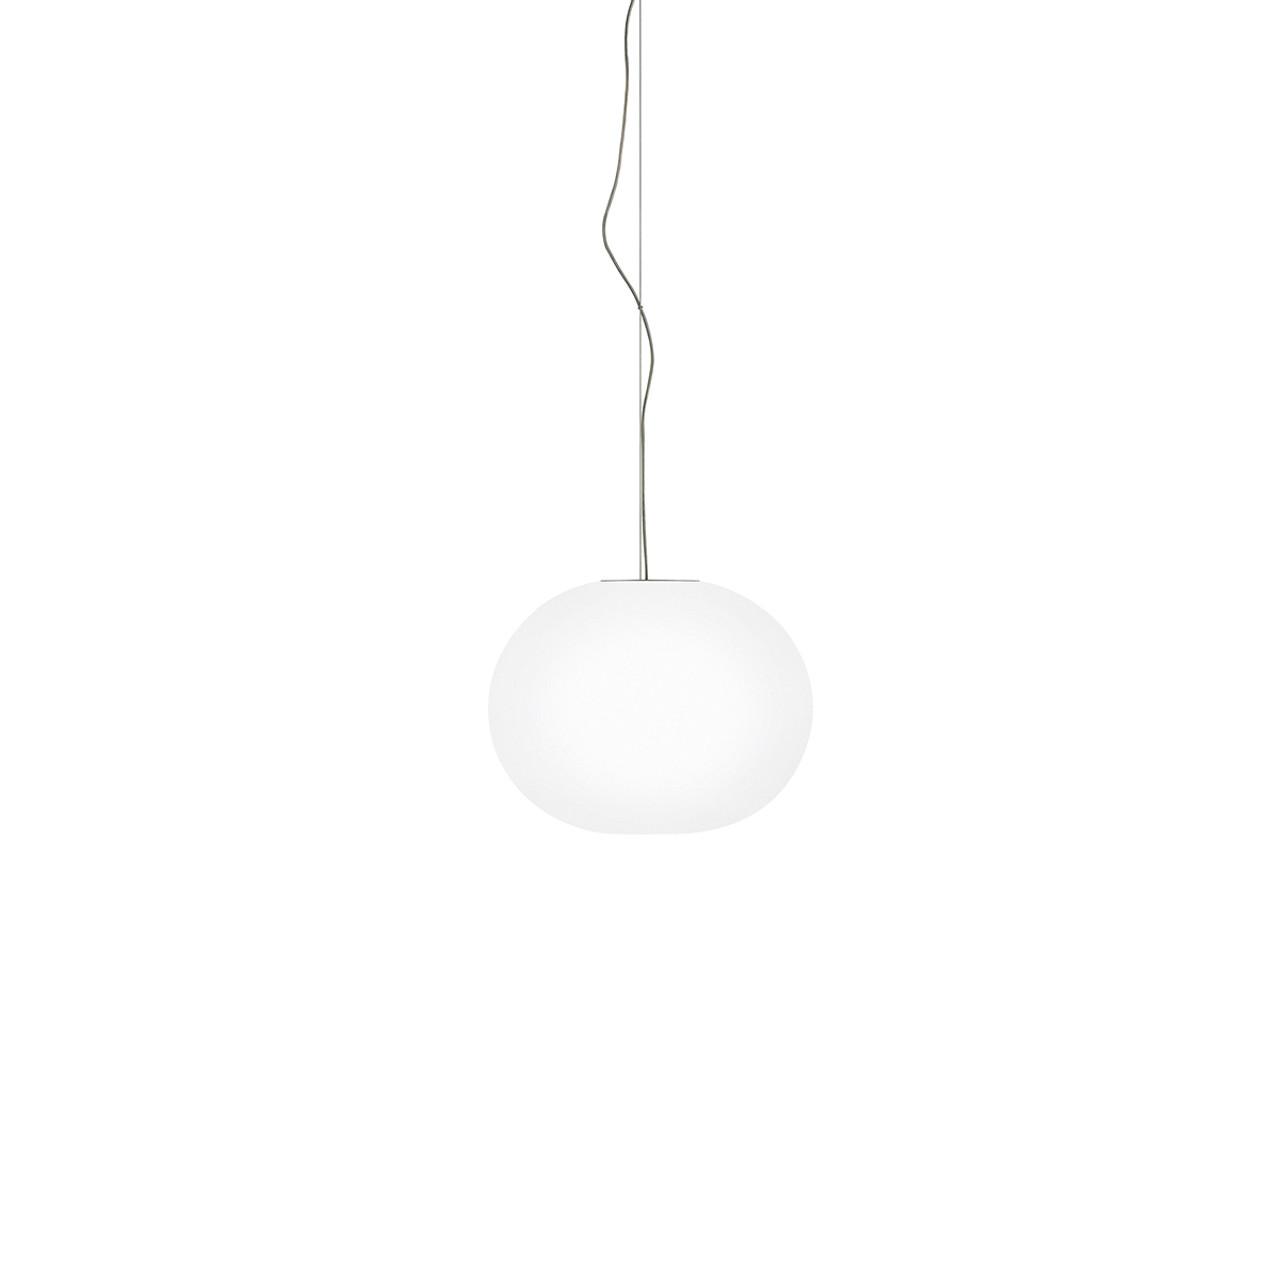 glo ball suspension lamp